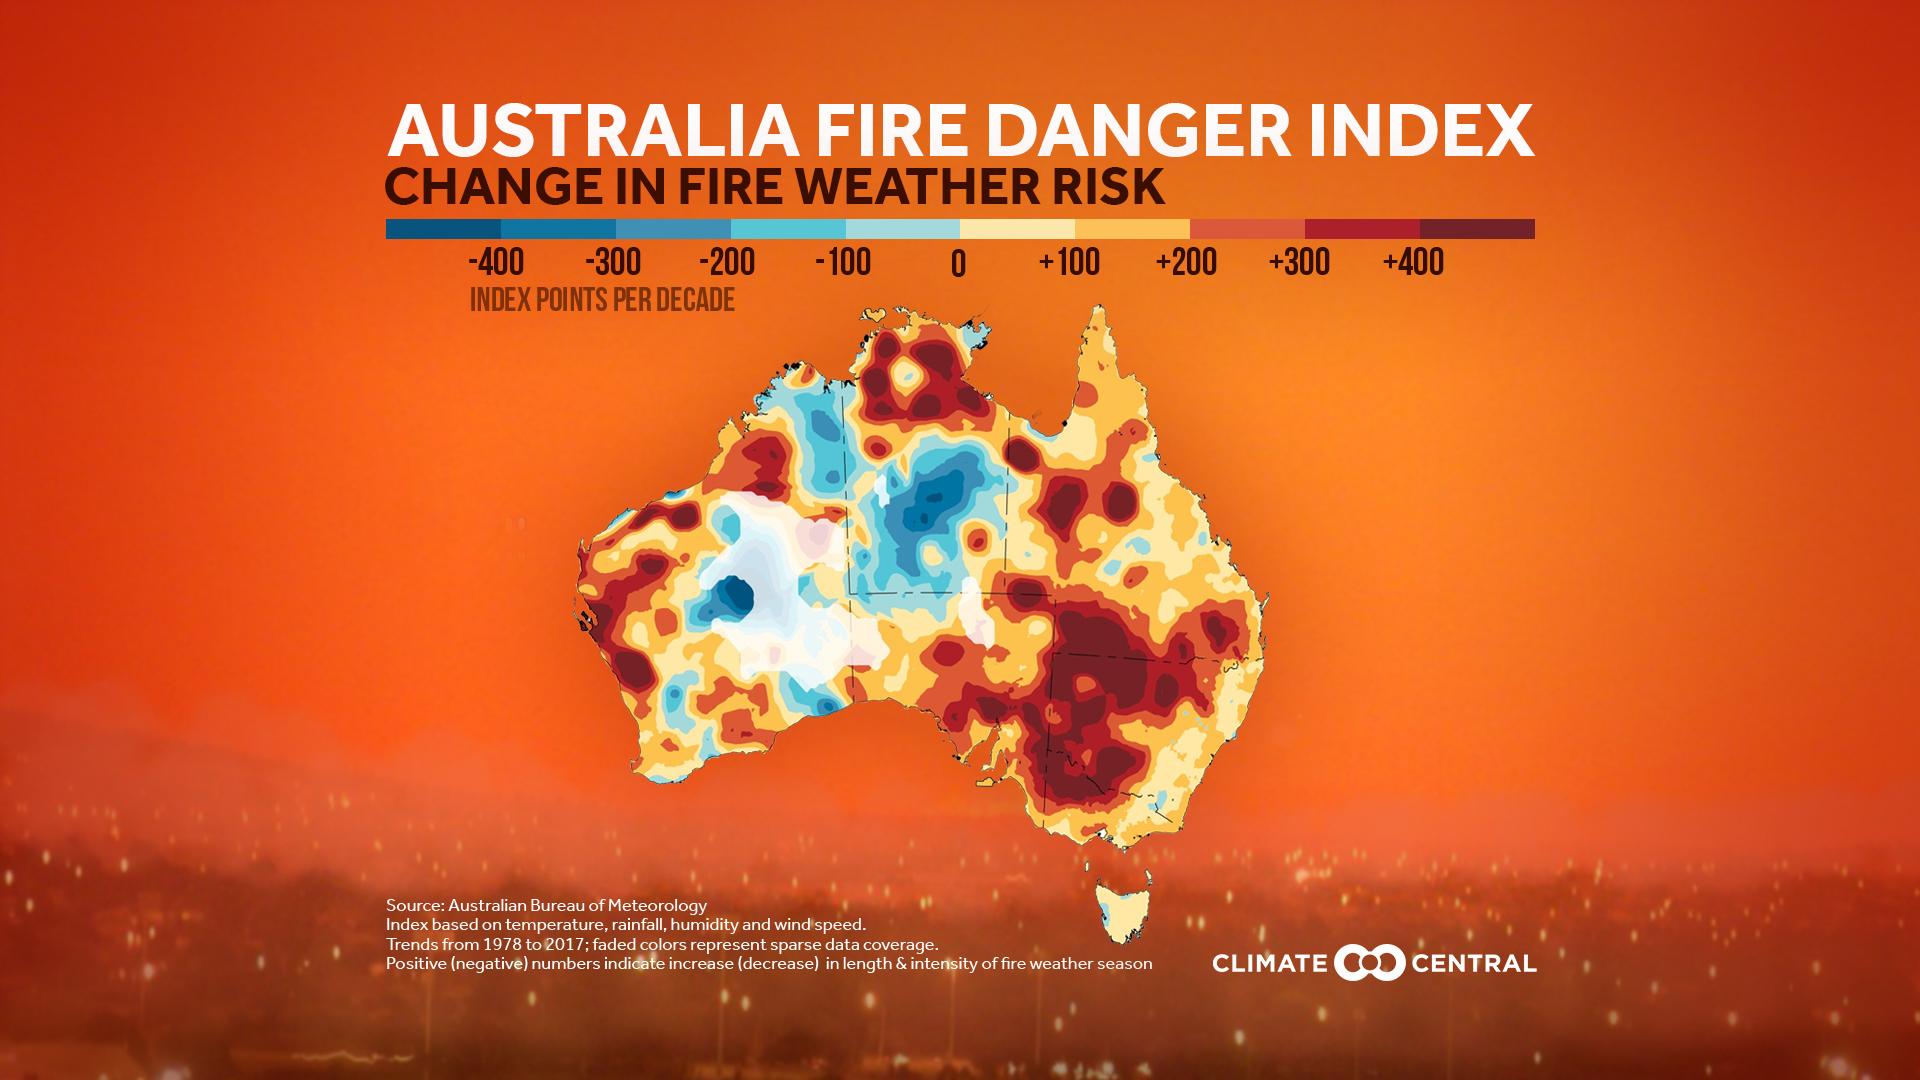 Australia Fire Danger Index